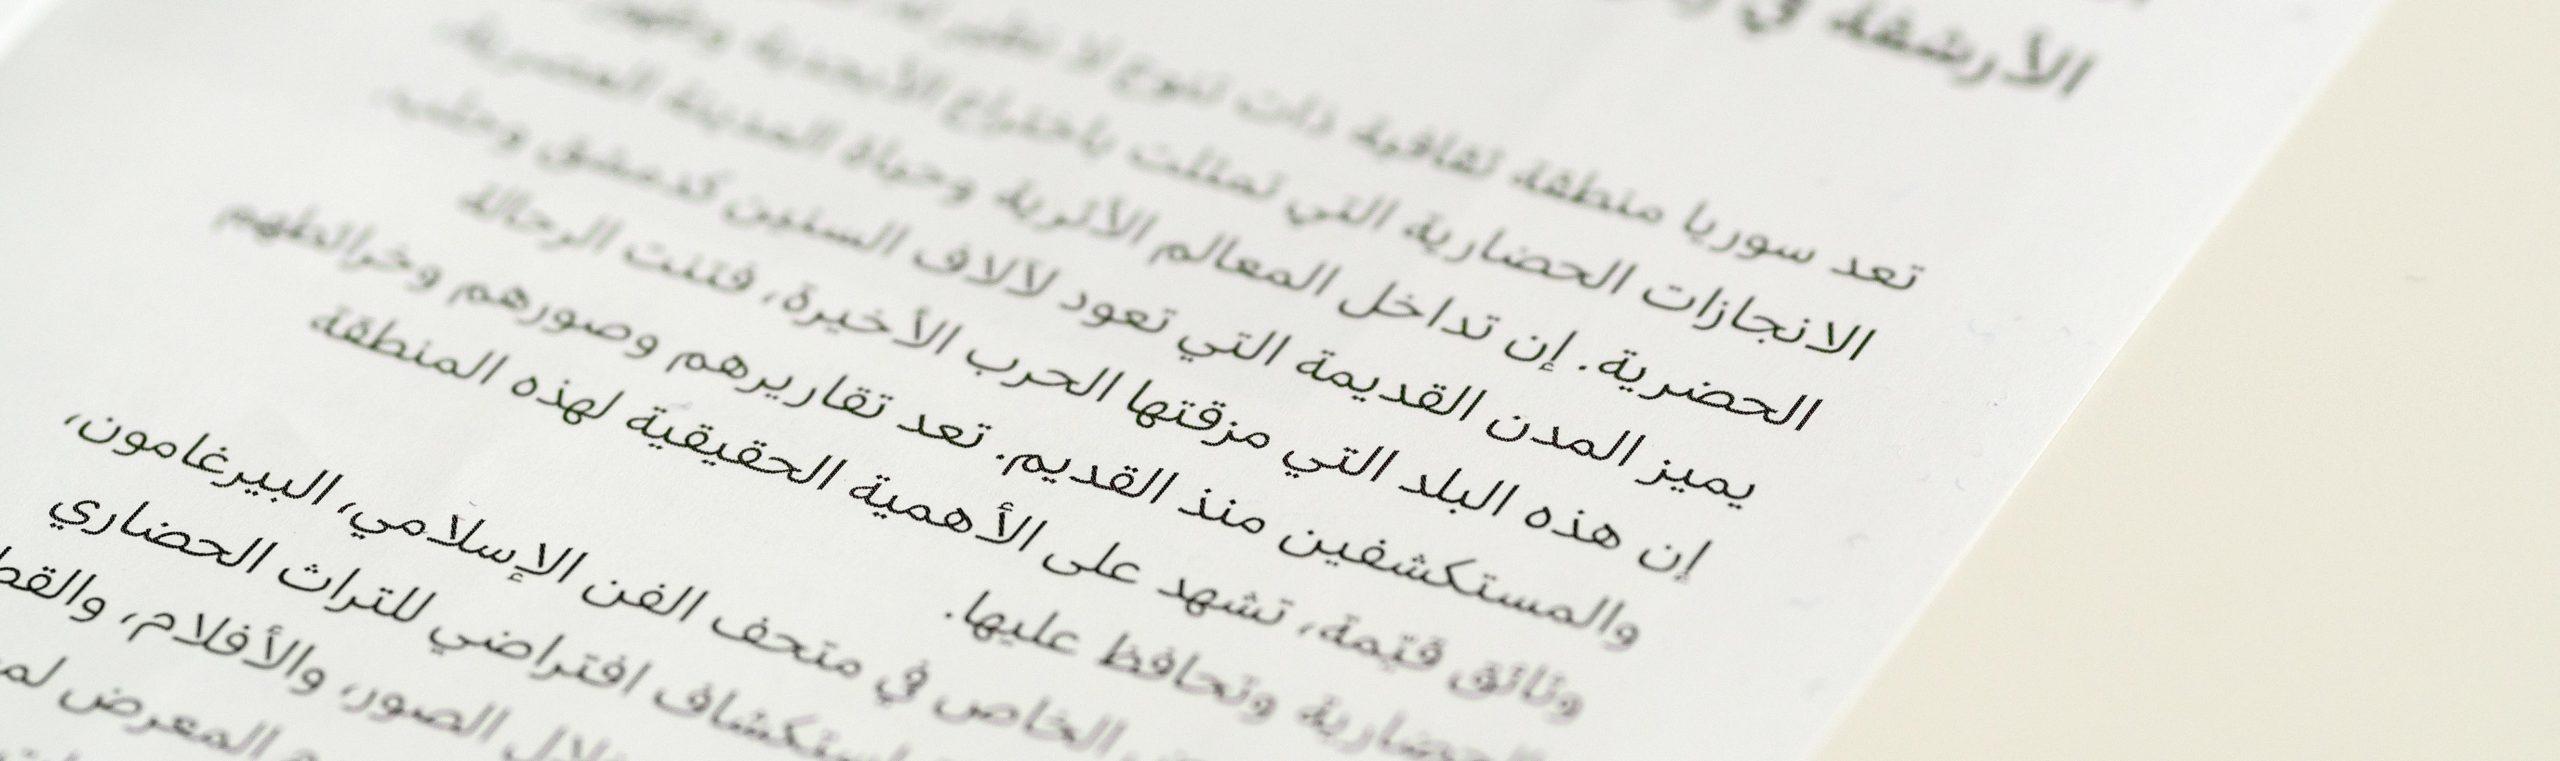 SkolarSansAr on Museum für Islamische Kunst Berlin folder 4